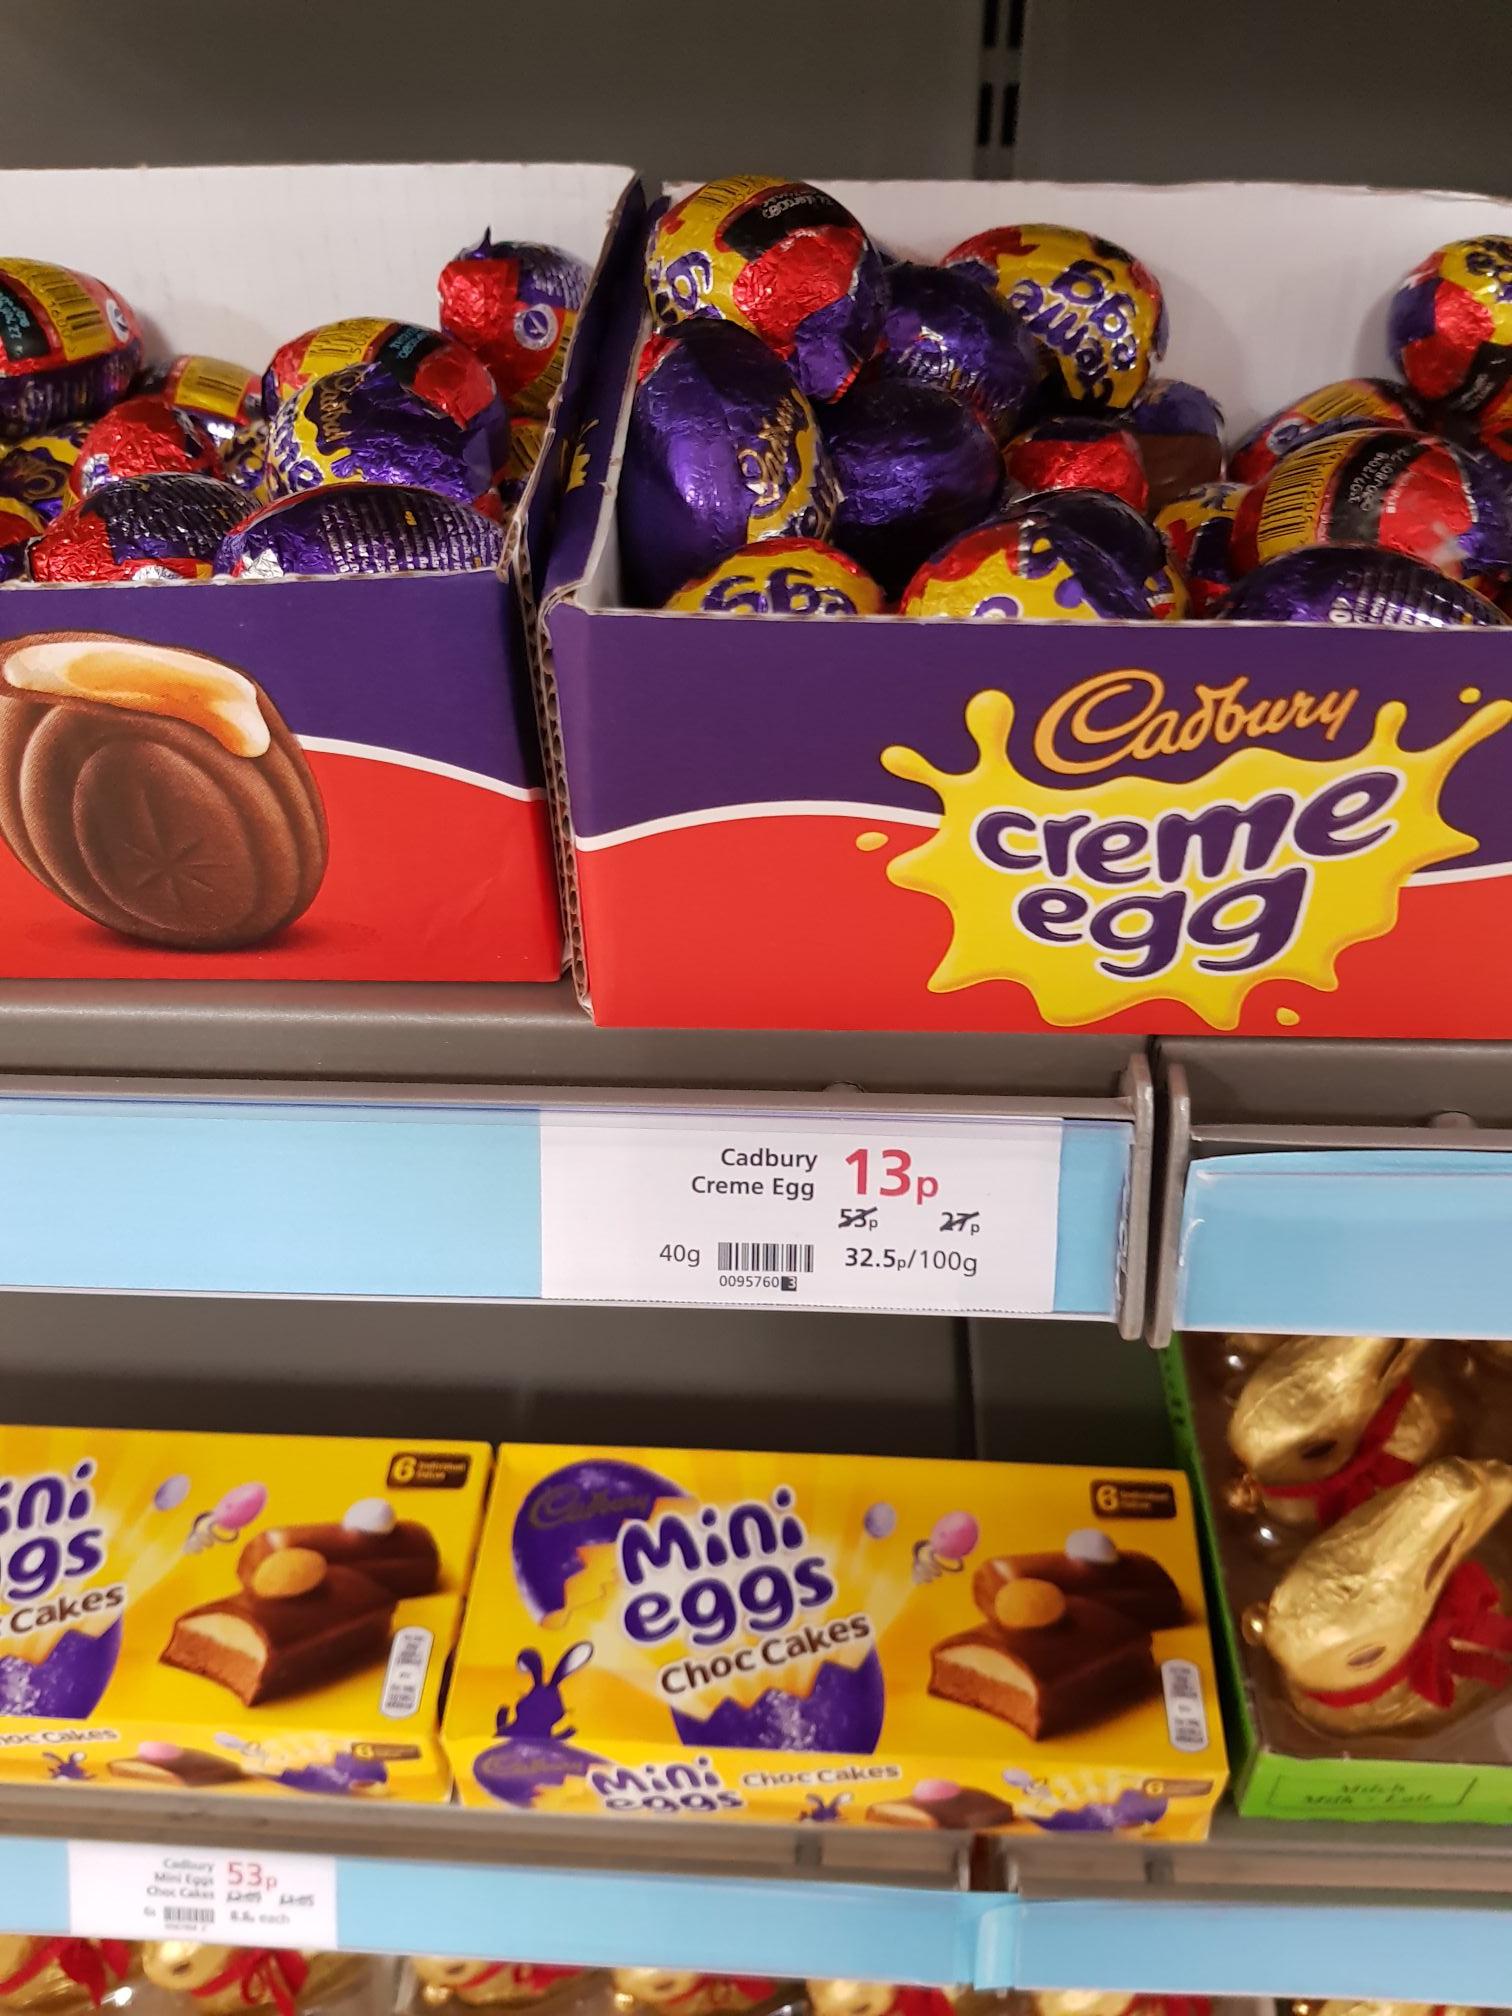 Cadbury creme eggs instore at CoOp instore for 13p